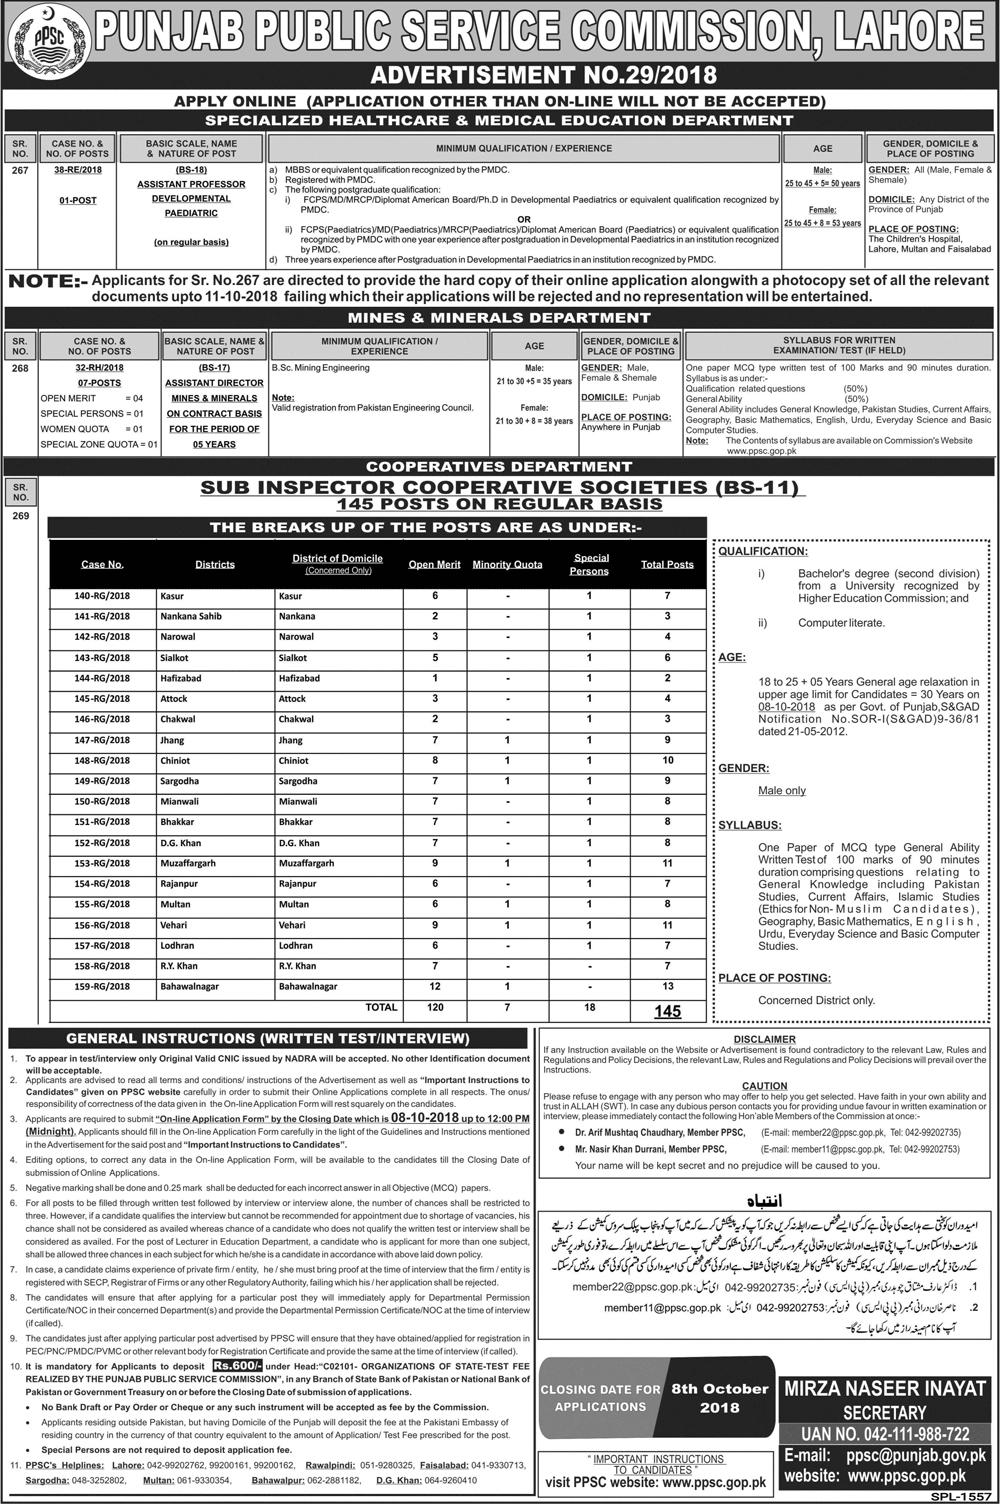 Sub Inspector Cooperative Societies PPSC Jobs 2018 Apply Online Advertisement